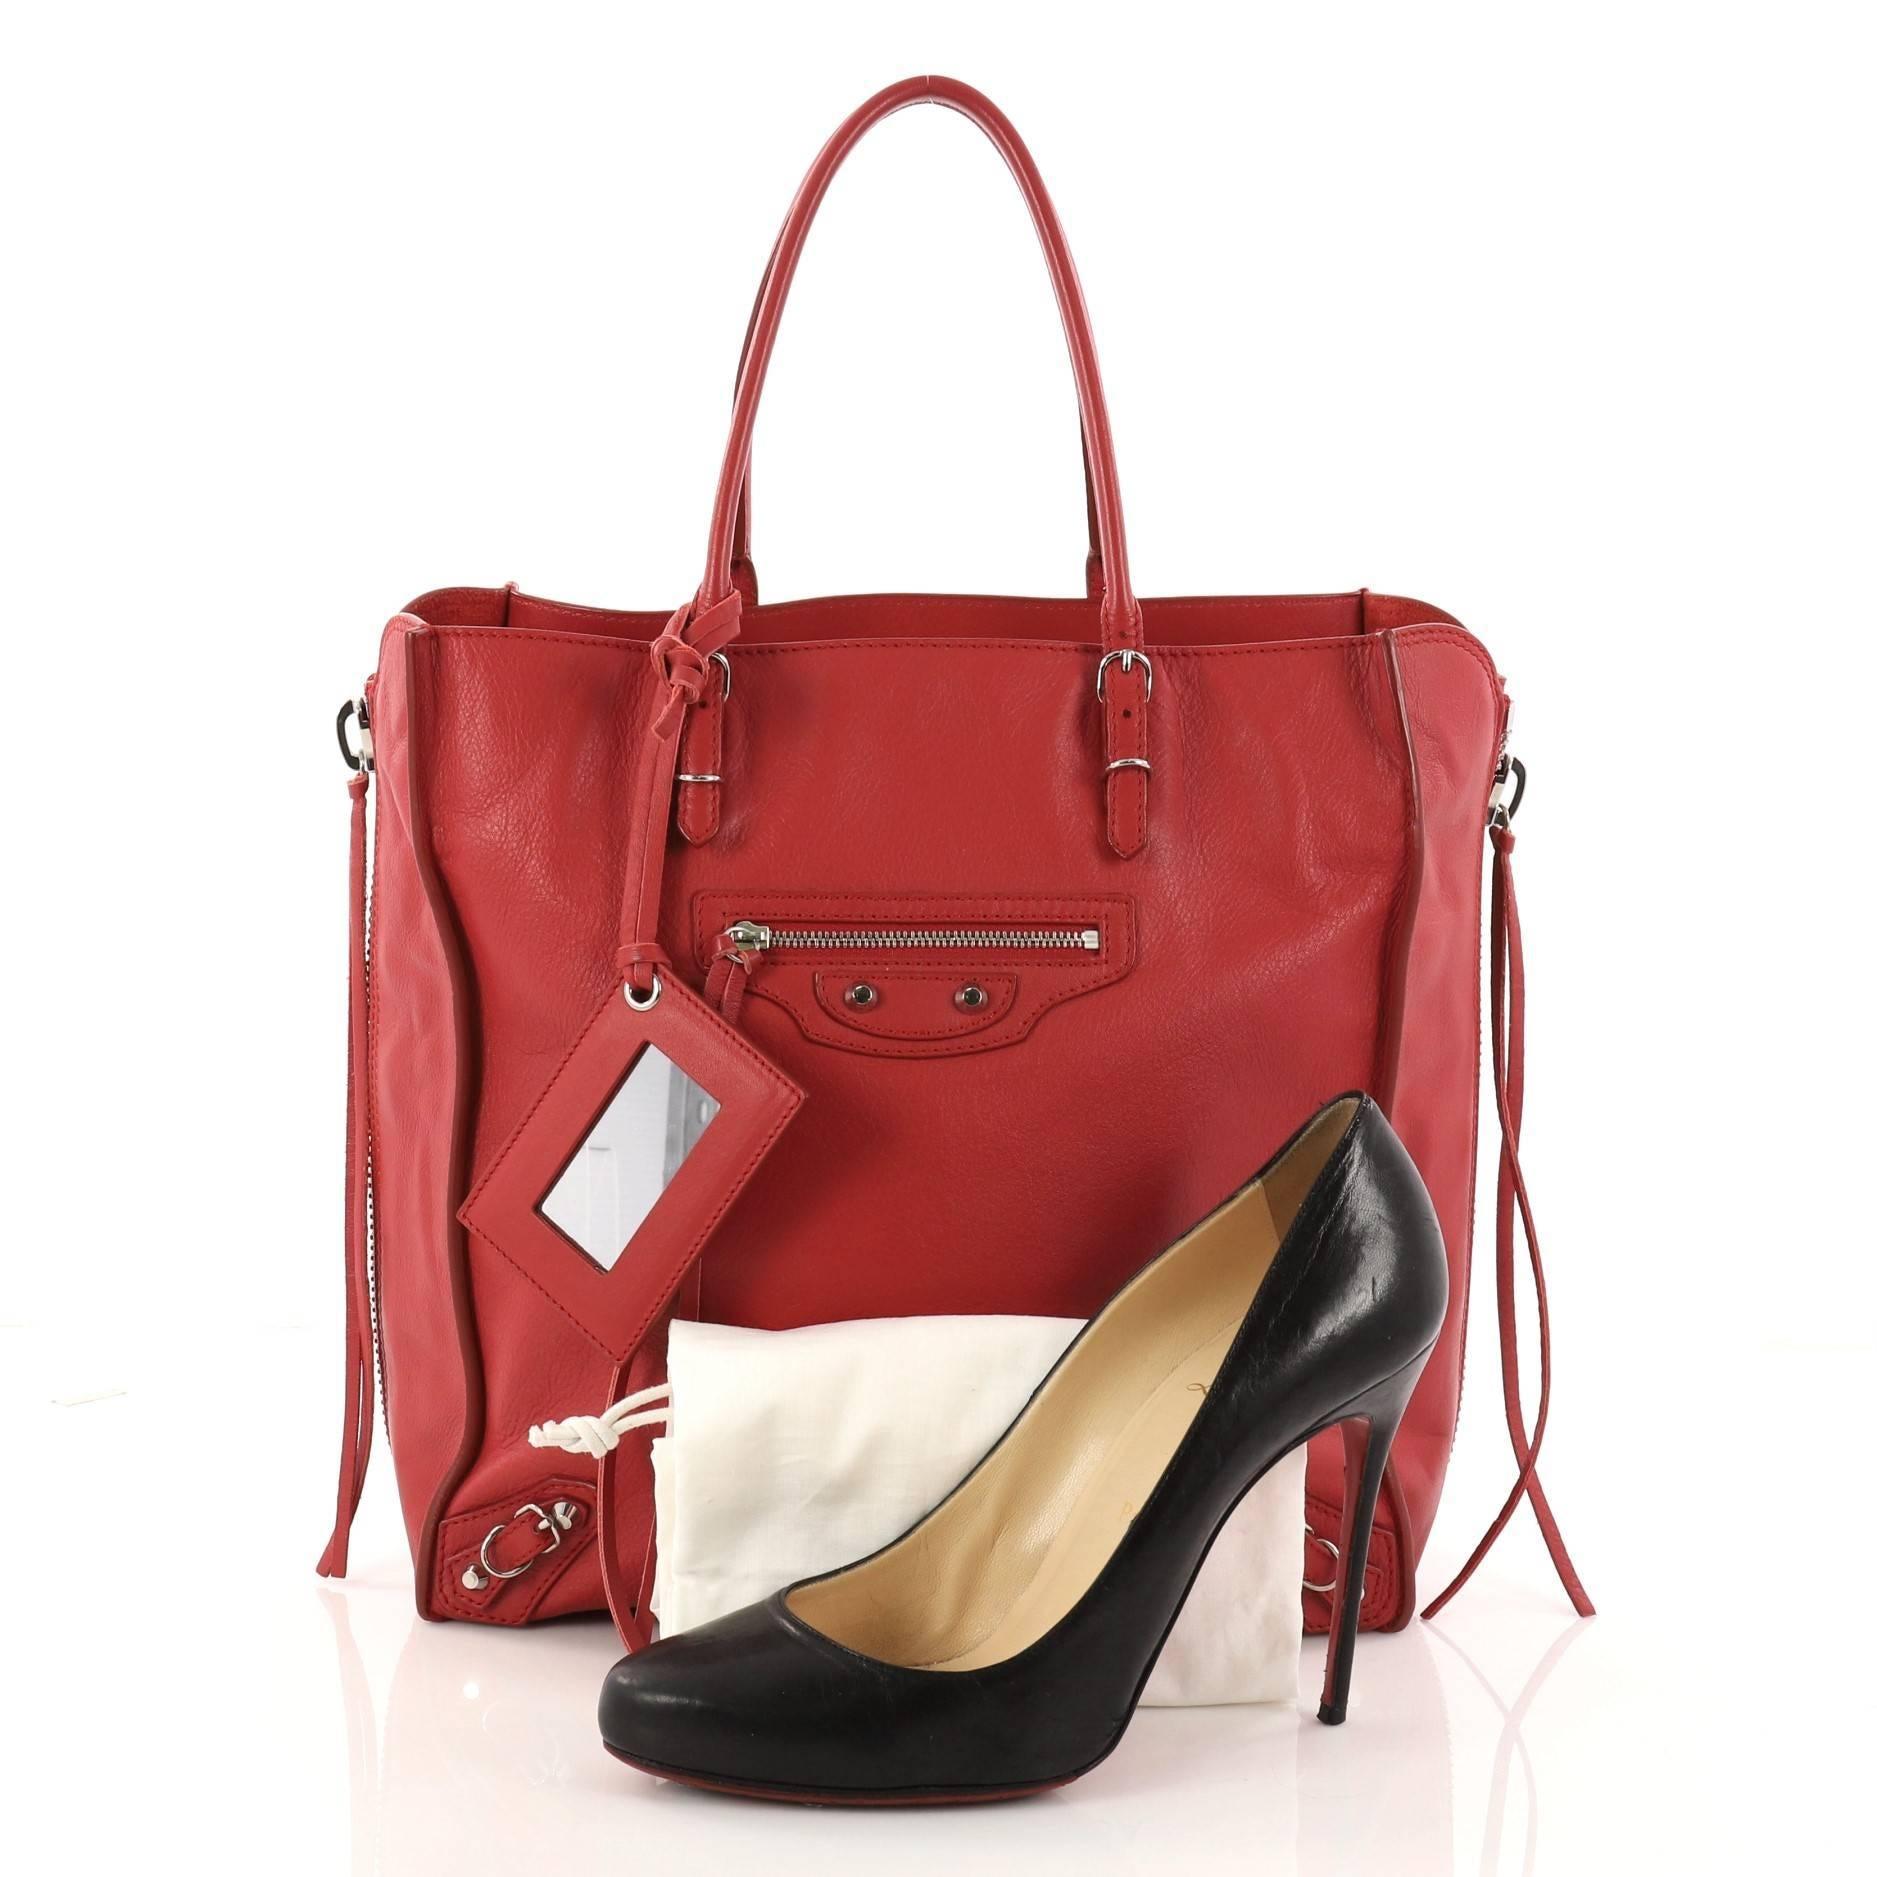 1f66d680f7394 Balenciaga Papier A4 Zip Around Classic Studs Handbag Leather Mini at  1stdibs